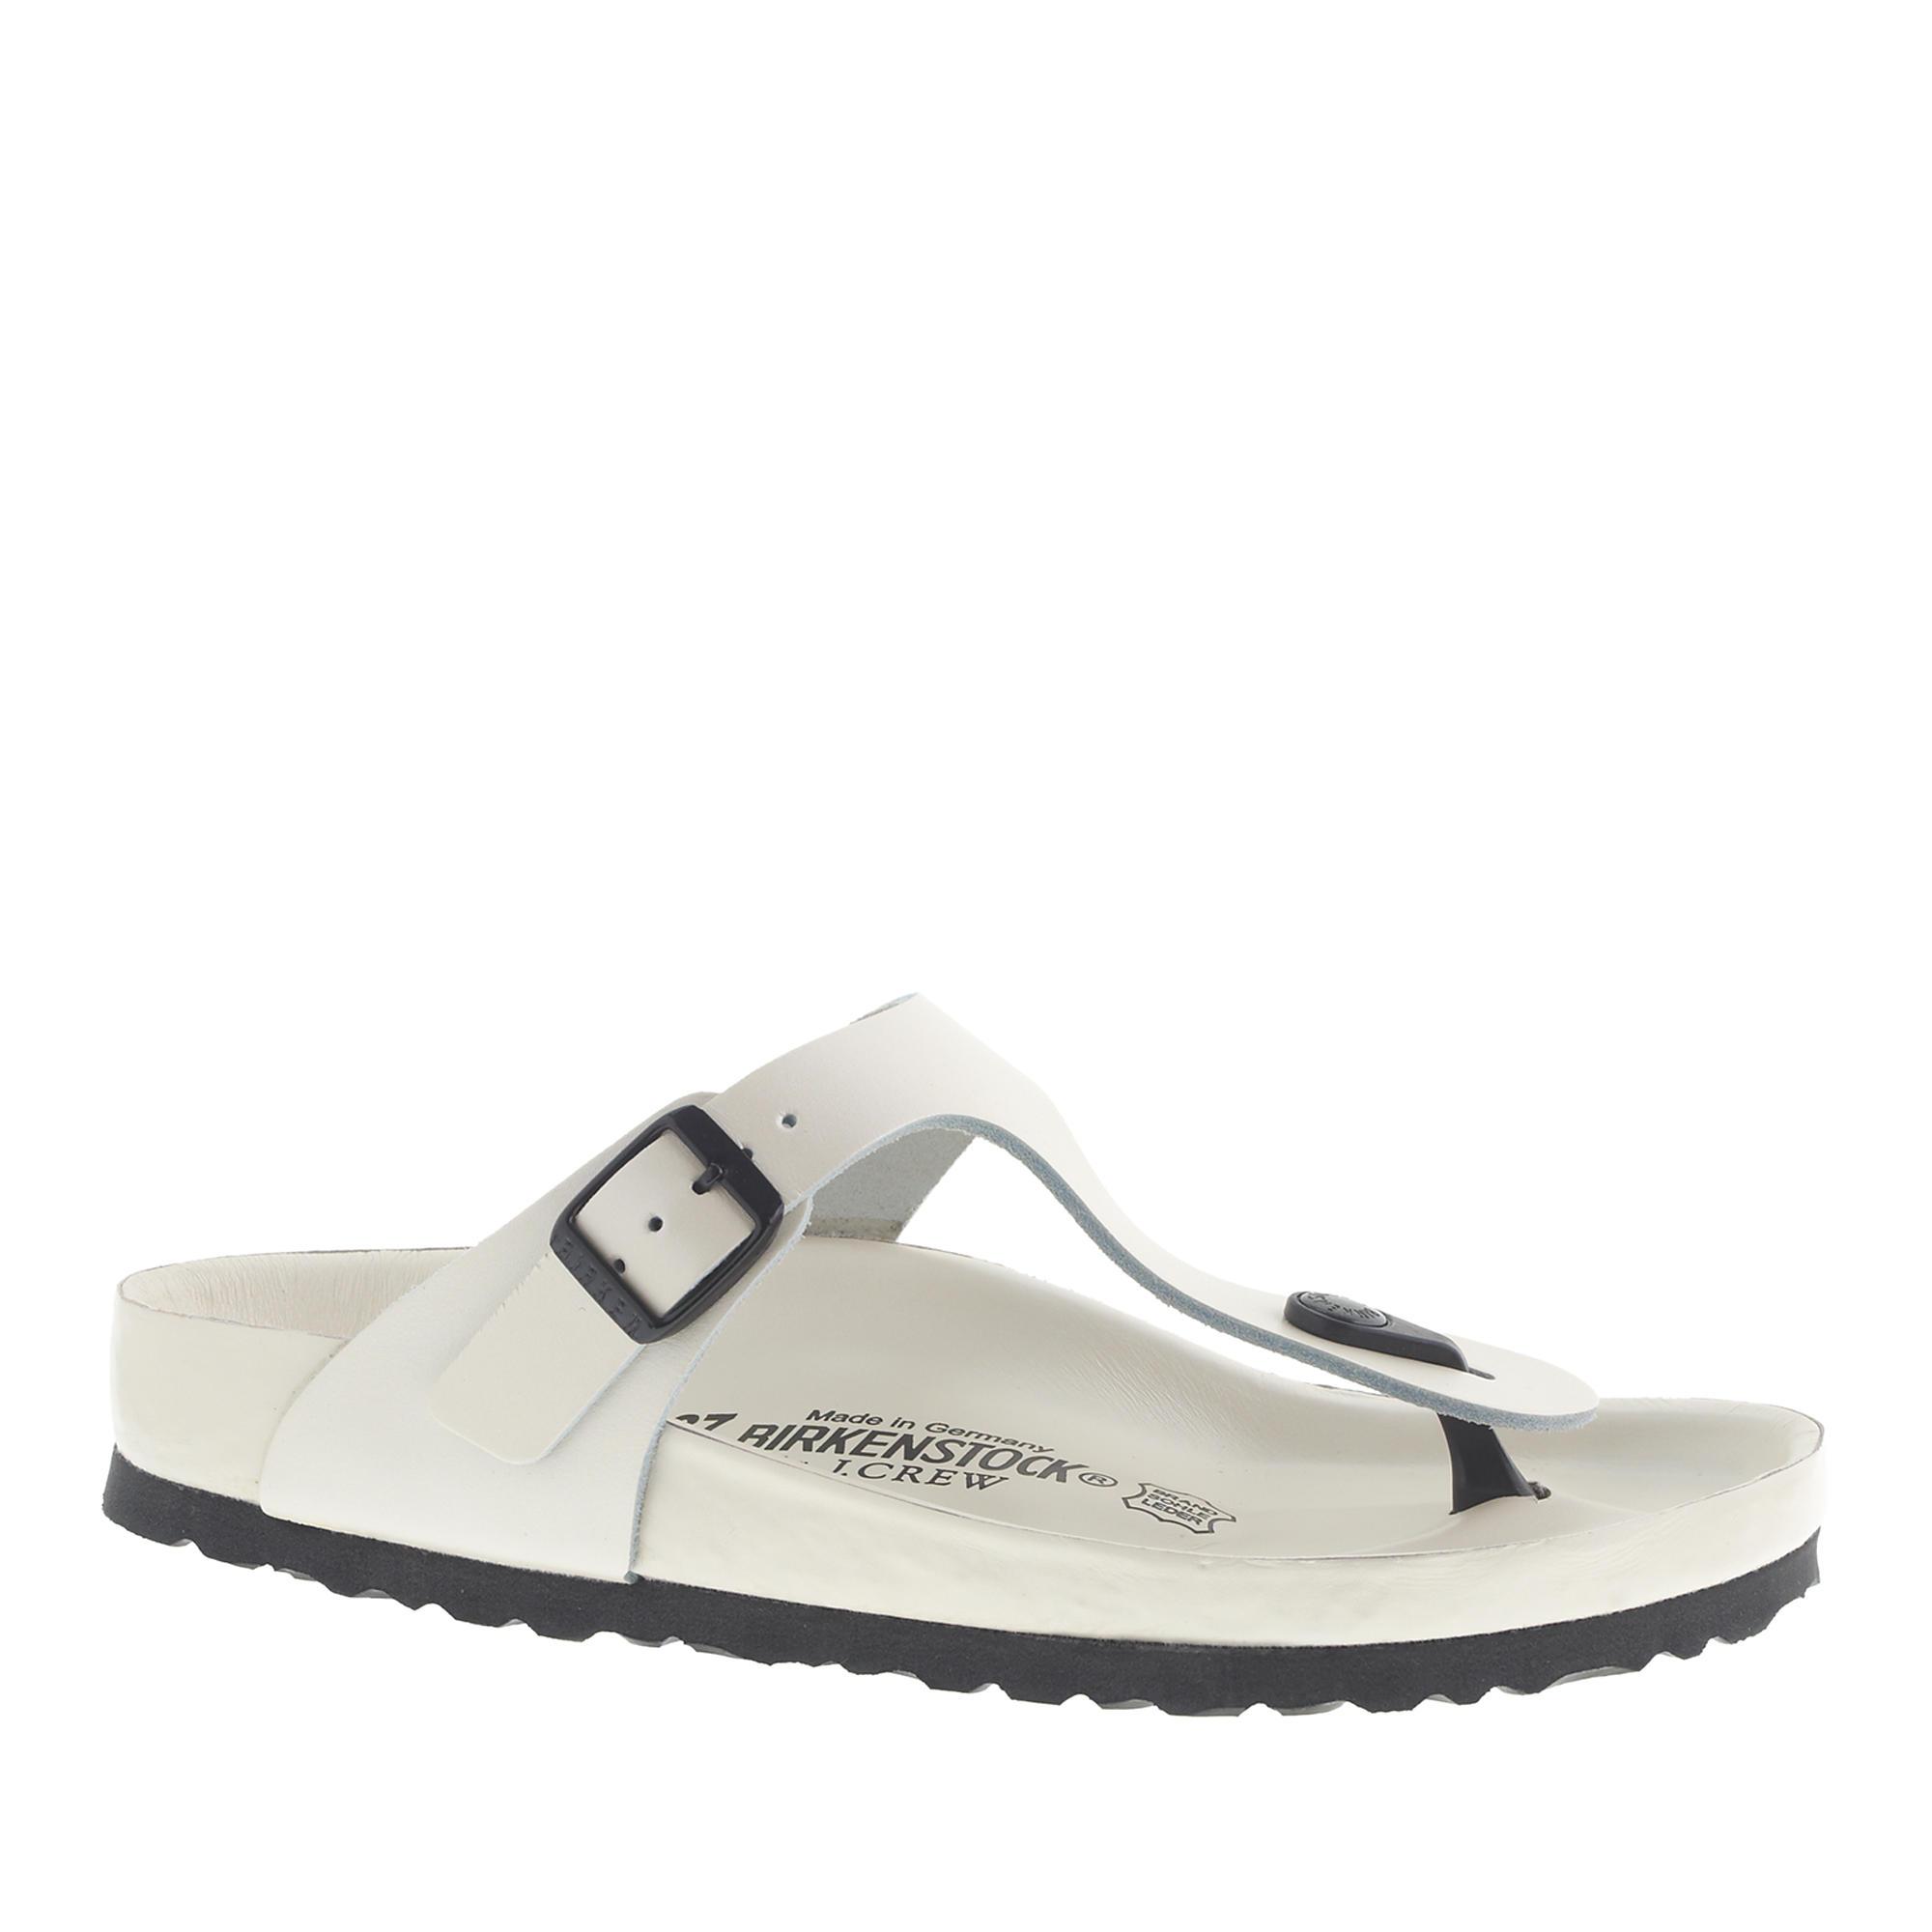 6ba72fcc3acf Lyst - J.Crew Women s Birkenstock Gizeh Exquisite Sandals in White